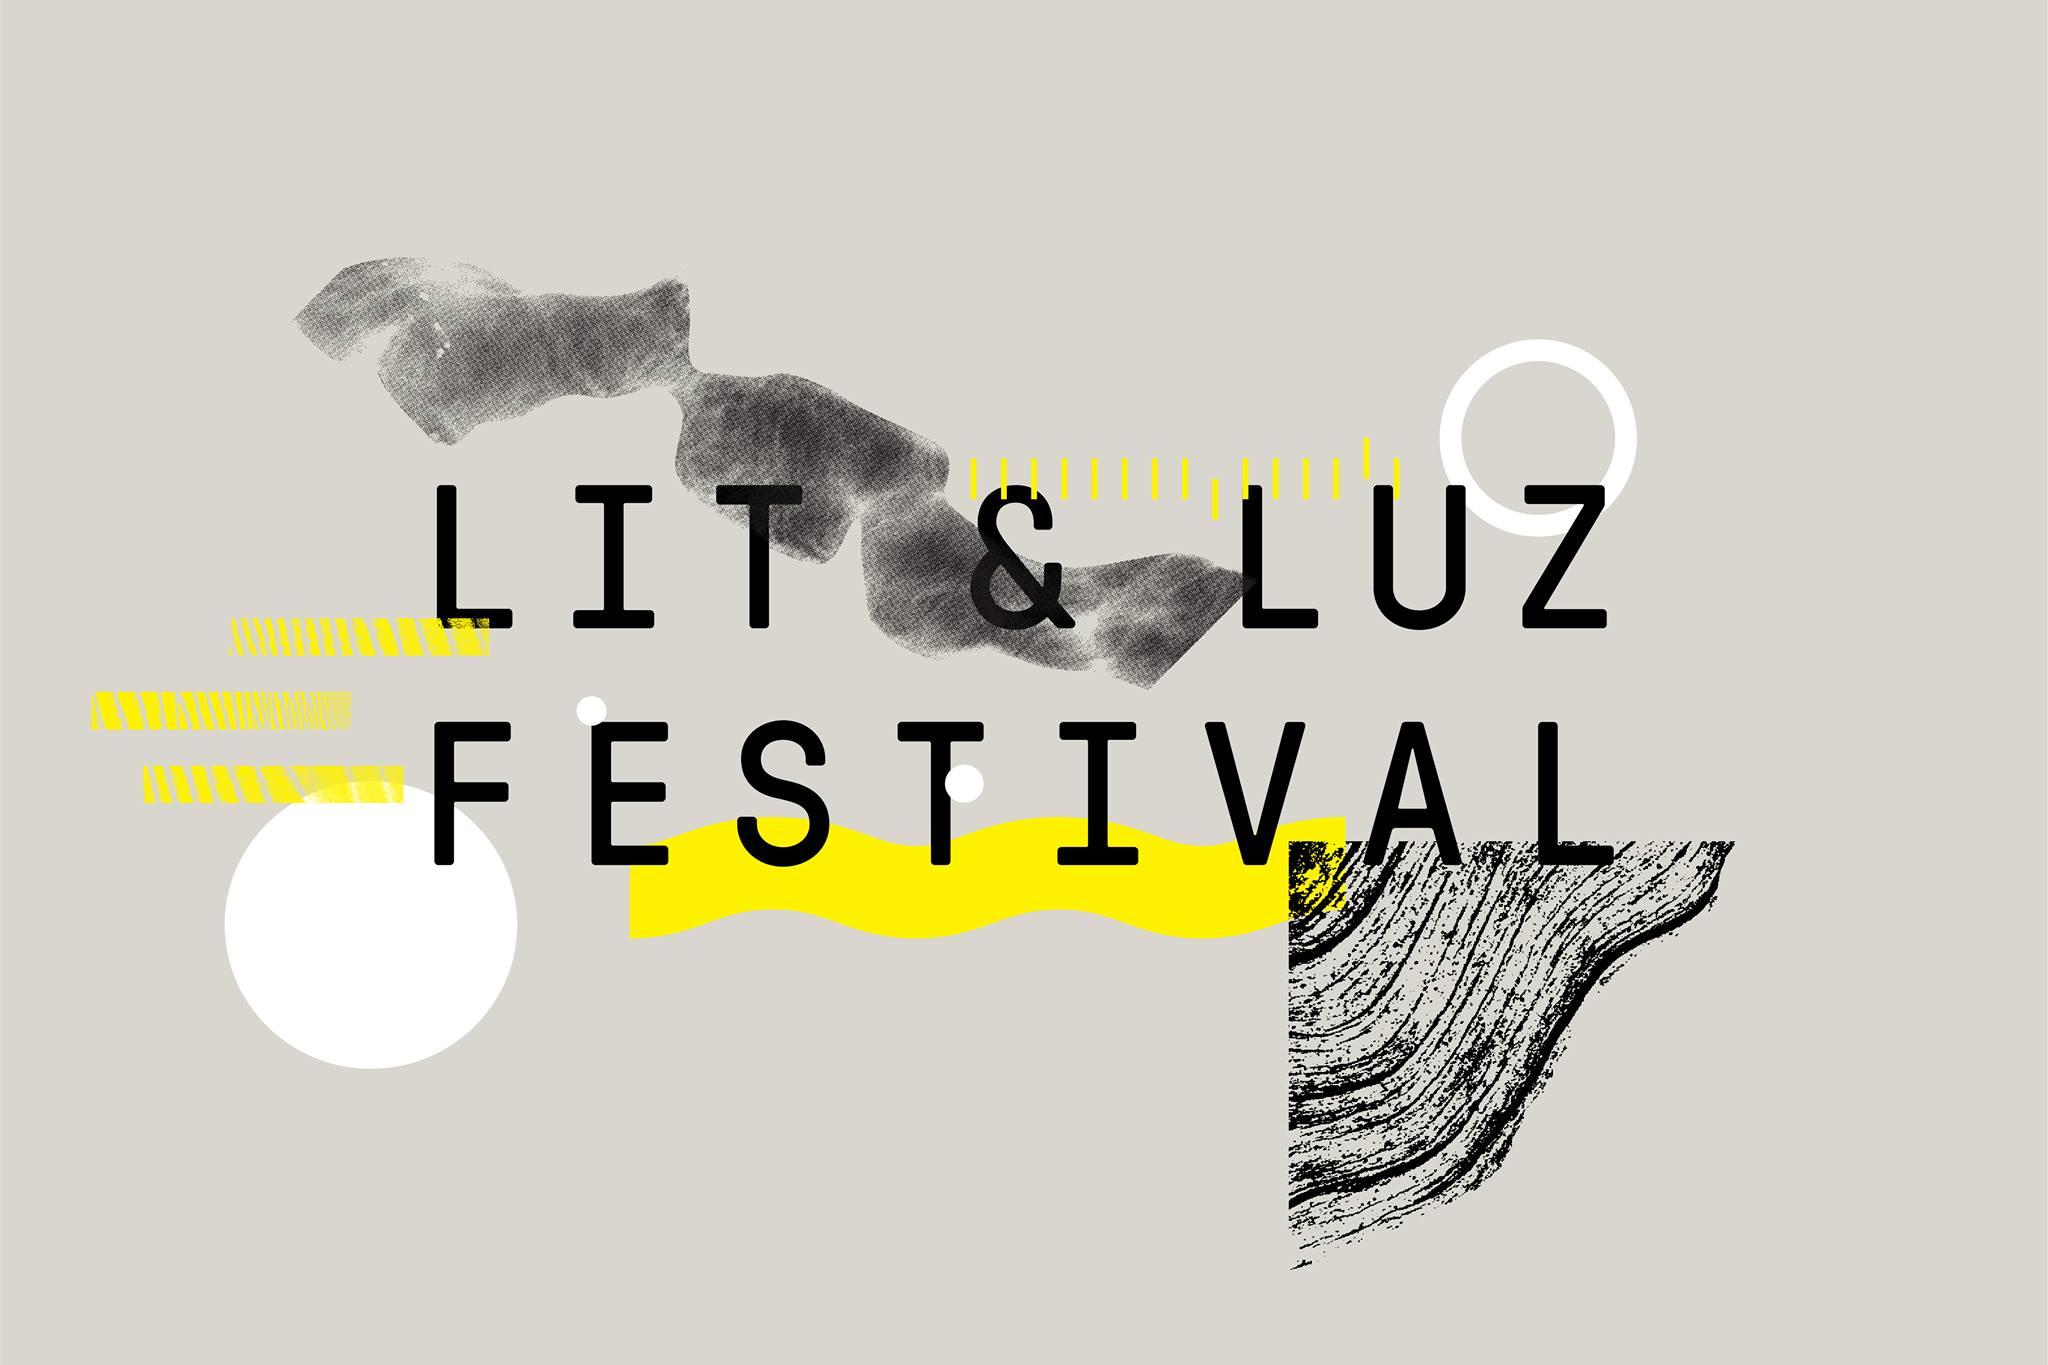 lit and luz festival.jpg